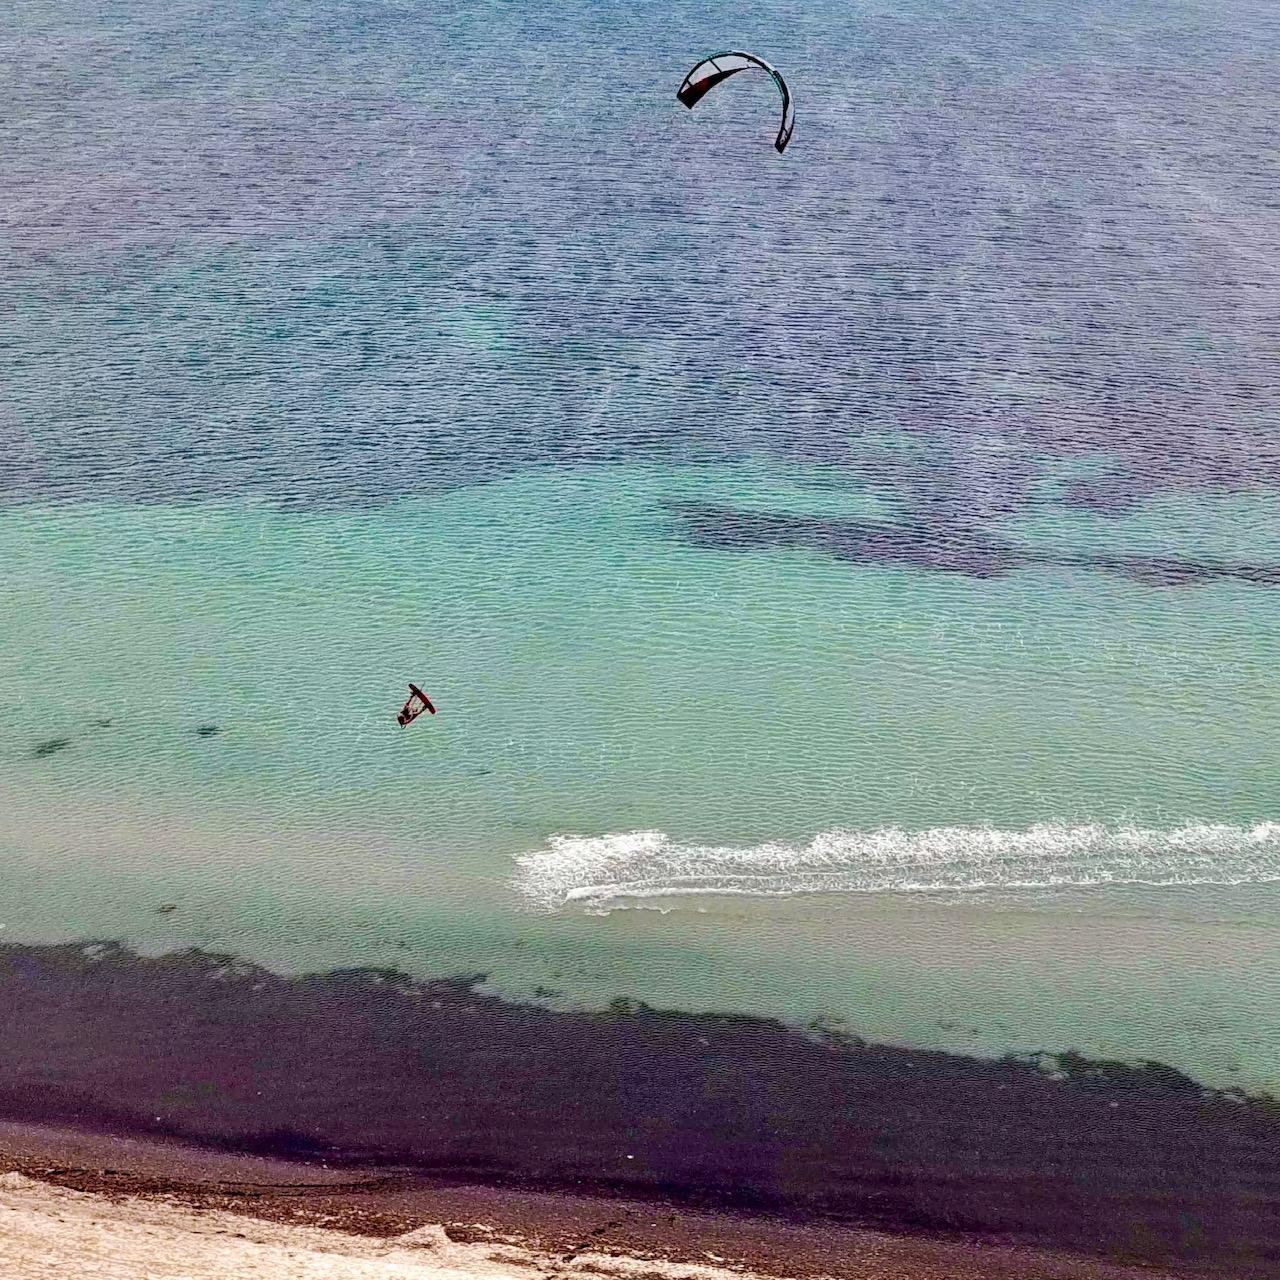 lo stagnone tahiti spot; conditions kitesurf sicile